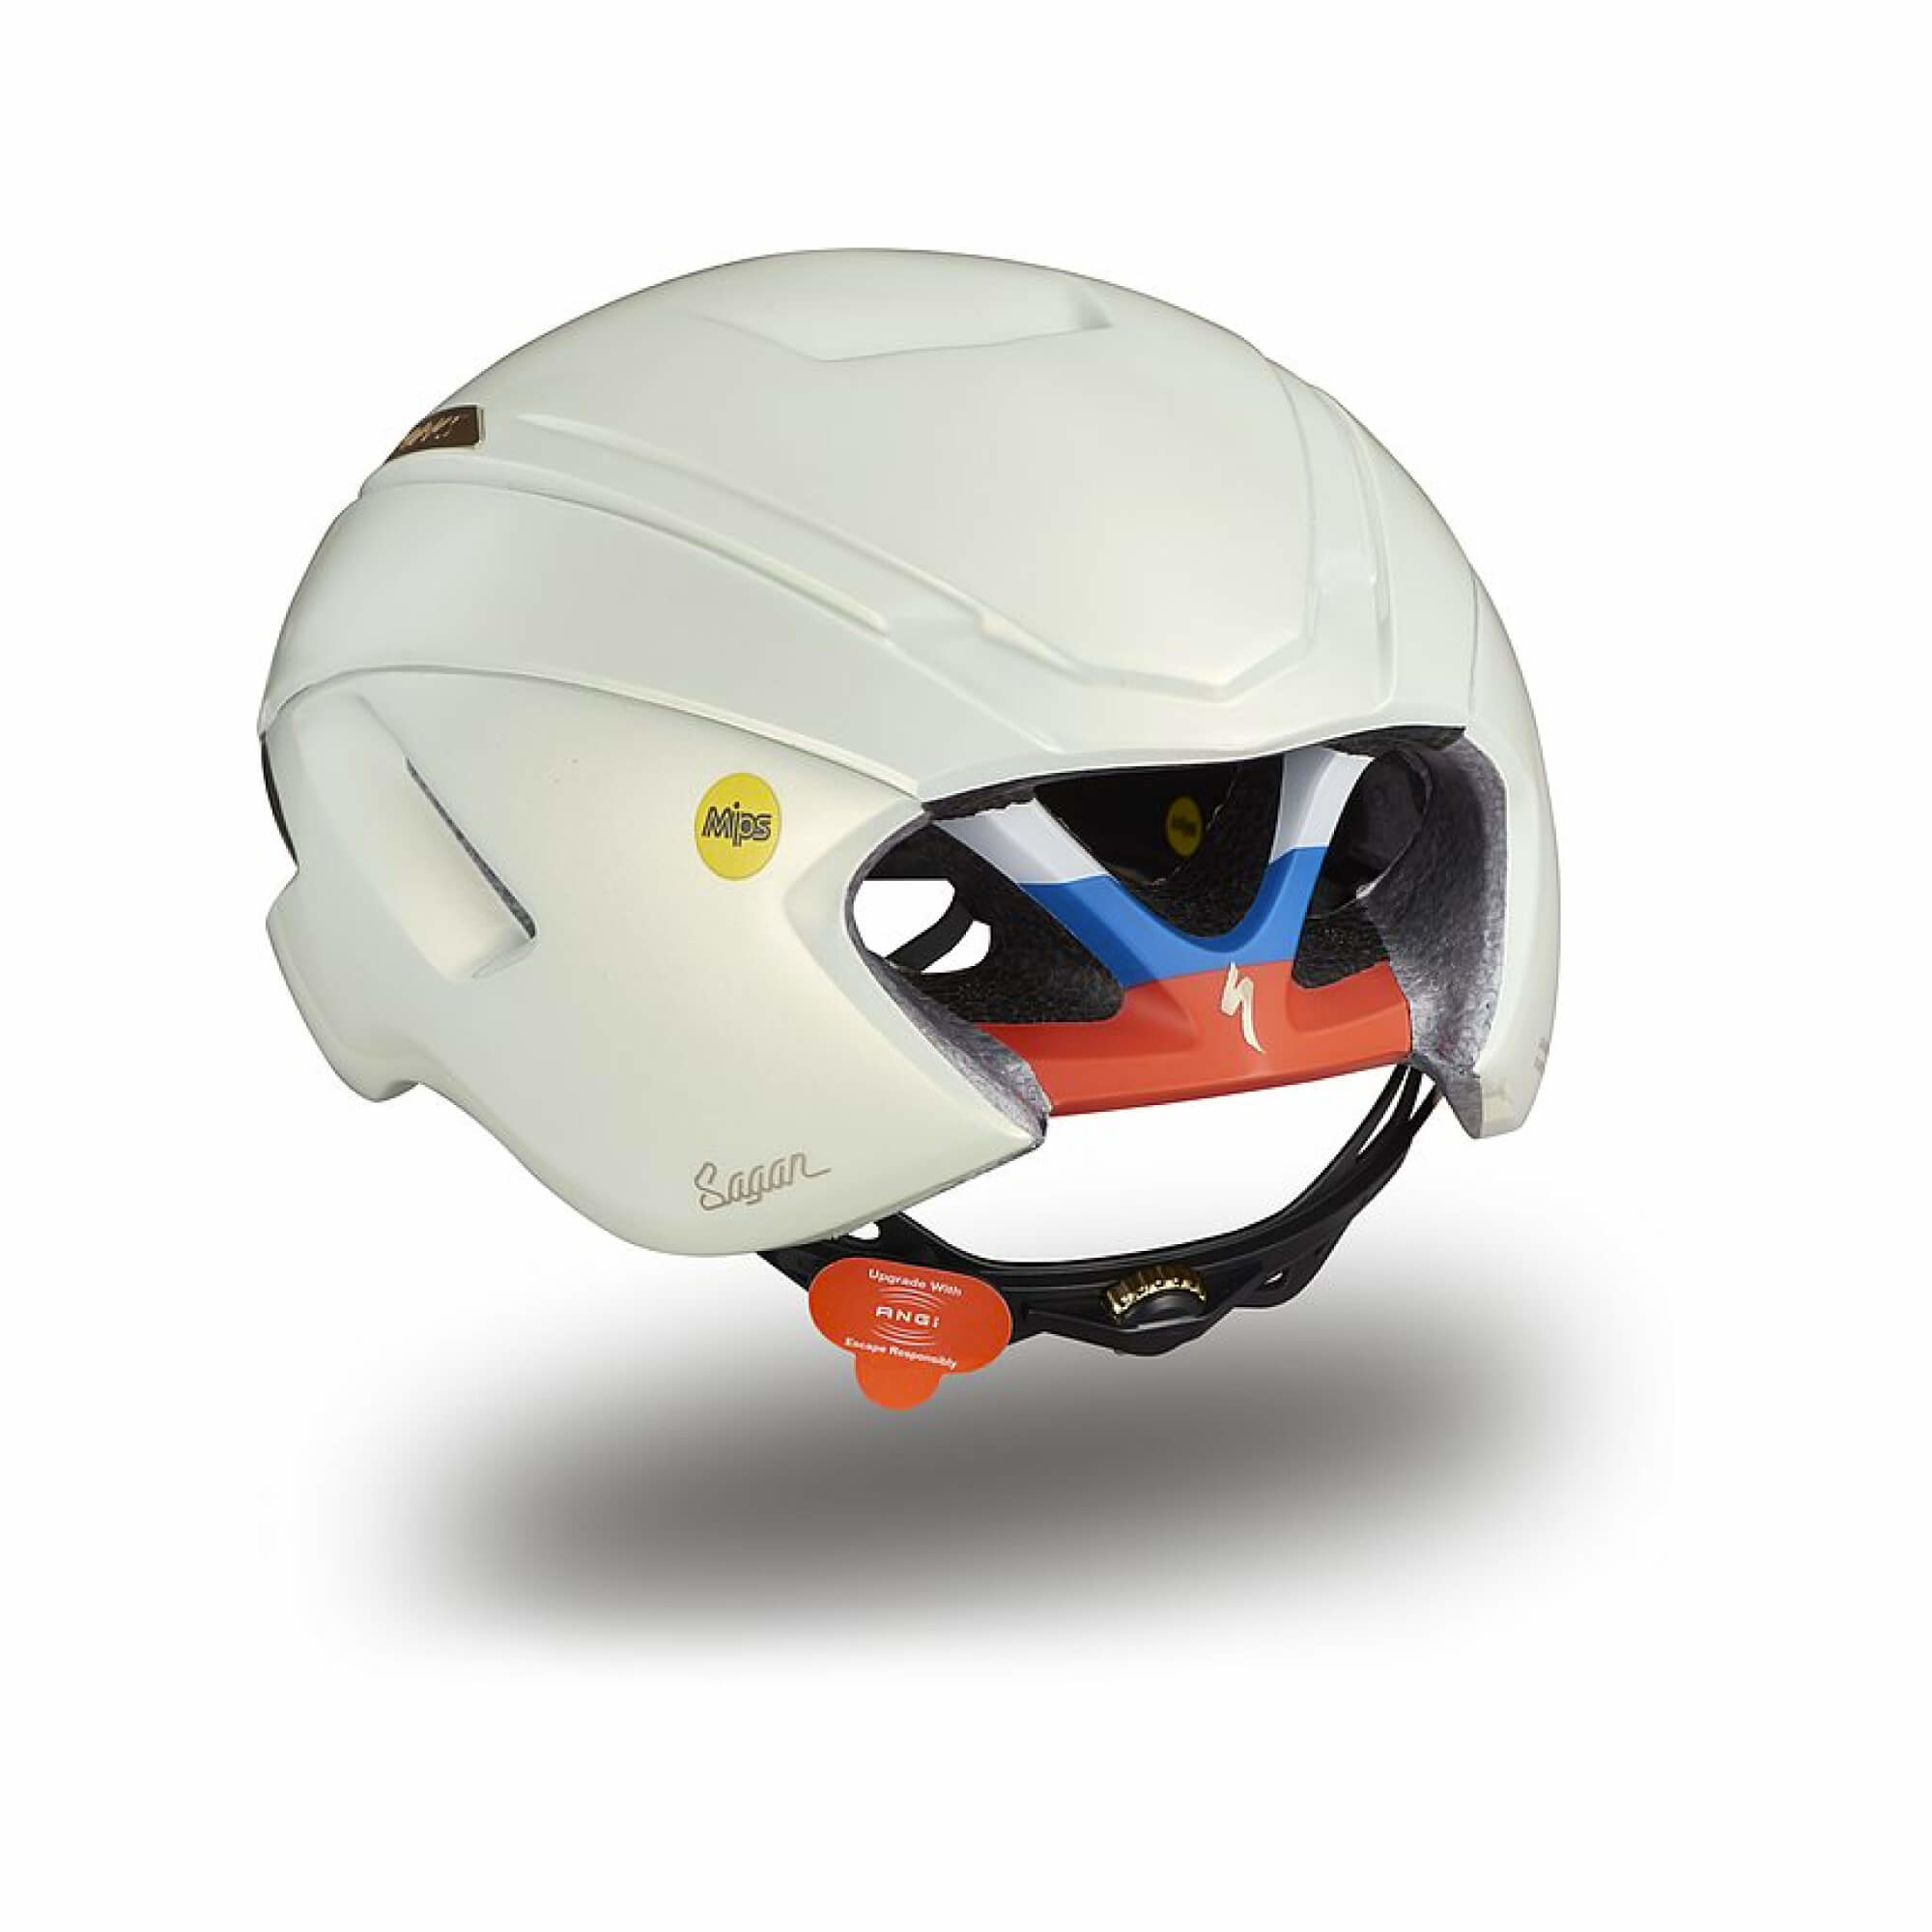 S-Works Evade II Helmet Angi Mips Sagan Disruption 2022-3